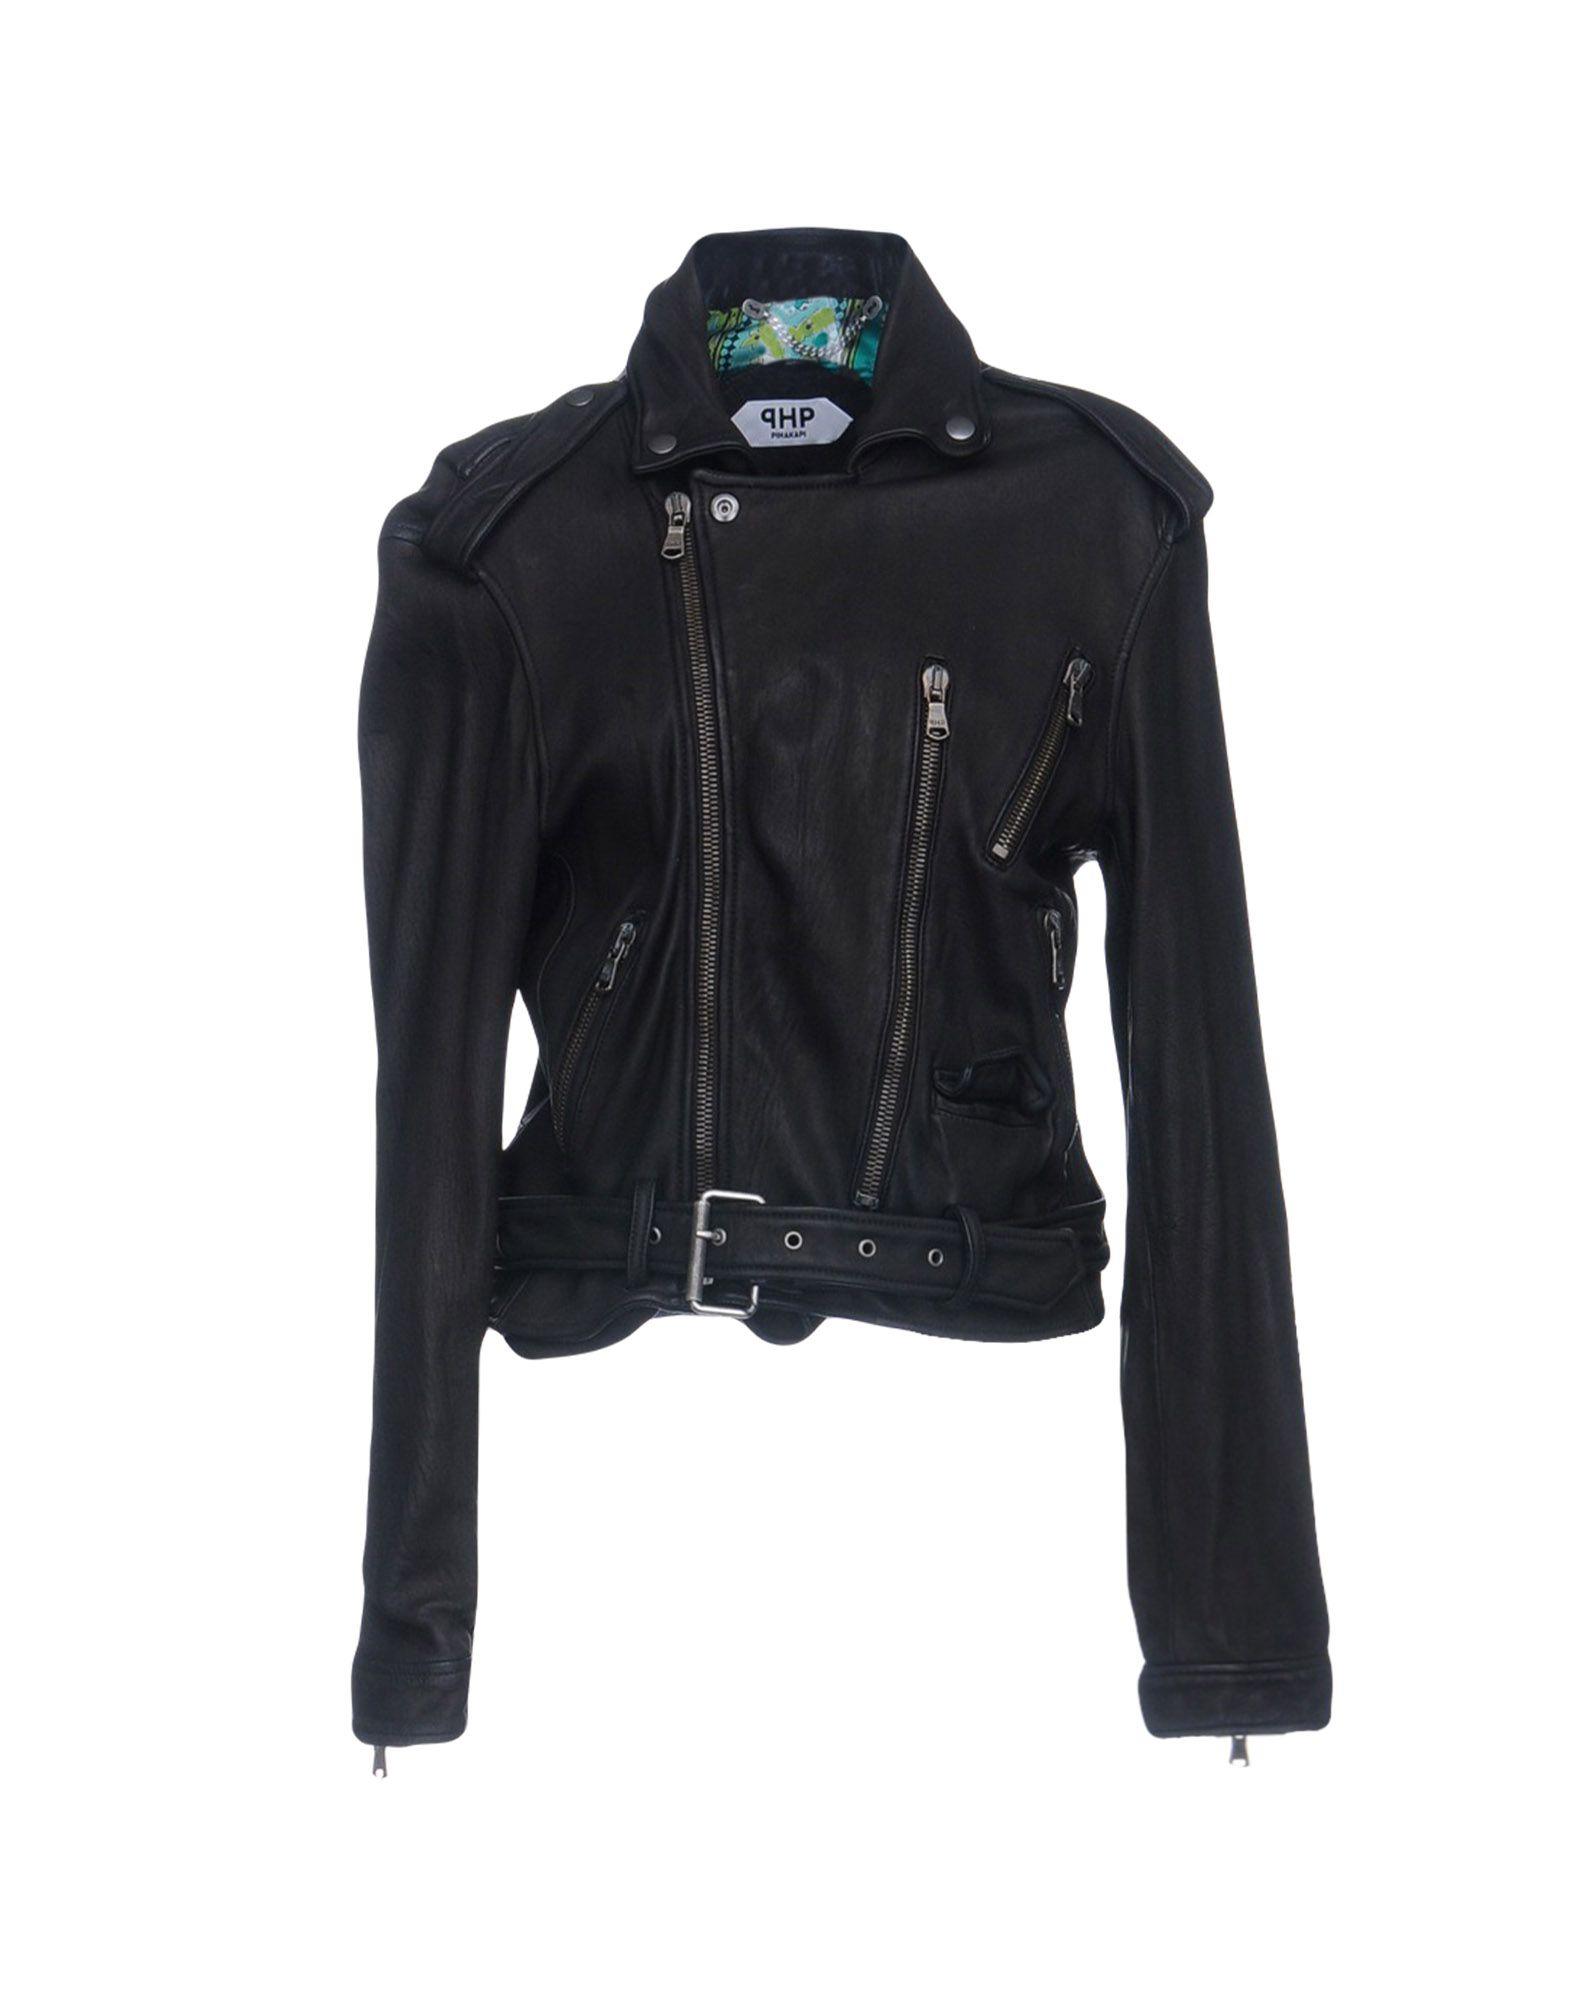 PIHAKAPI Biker Jacket in Dark Brown